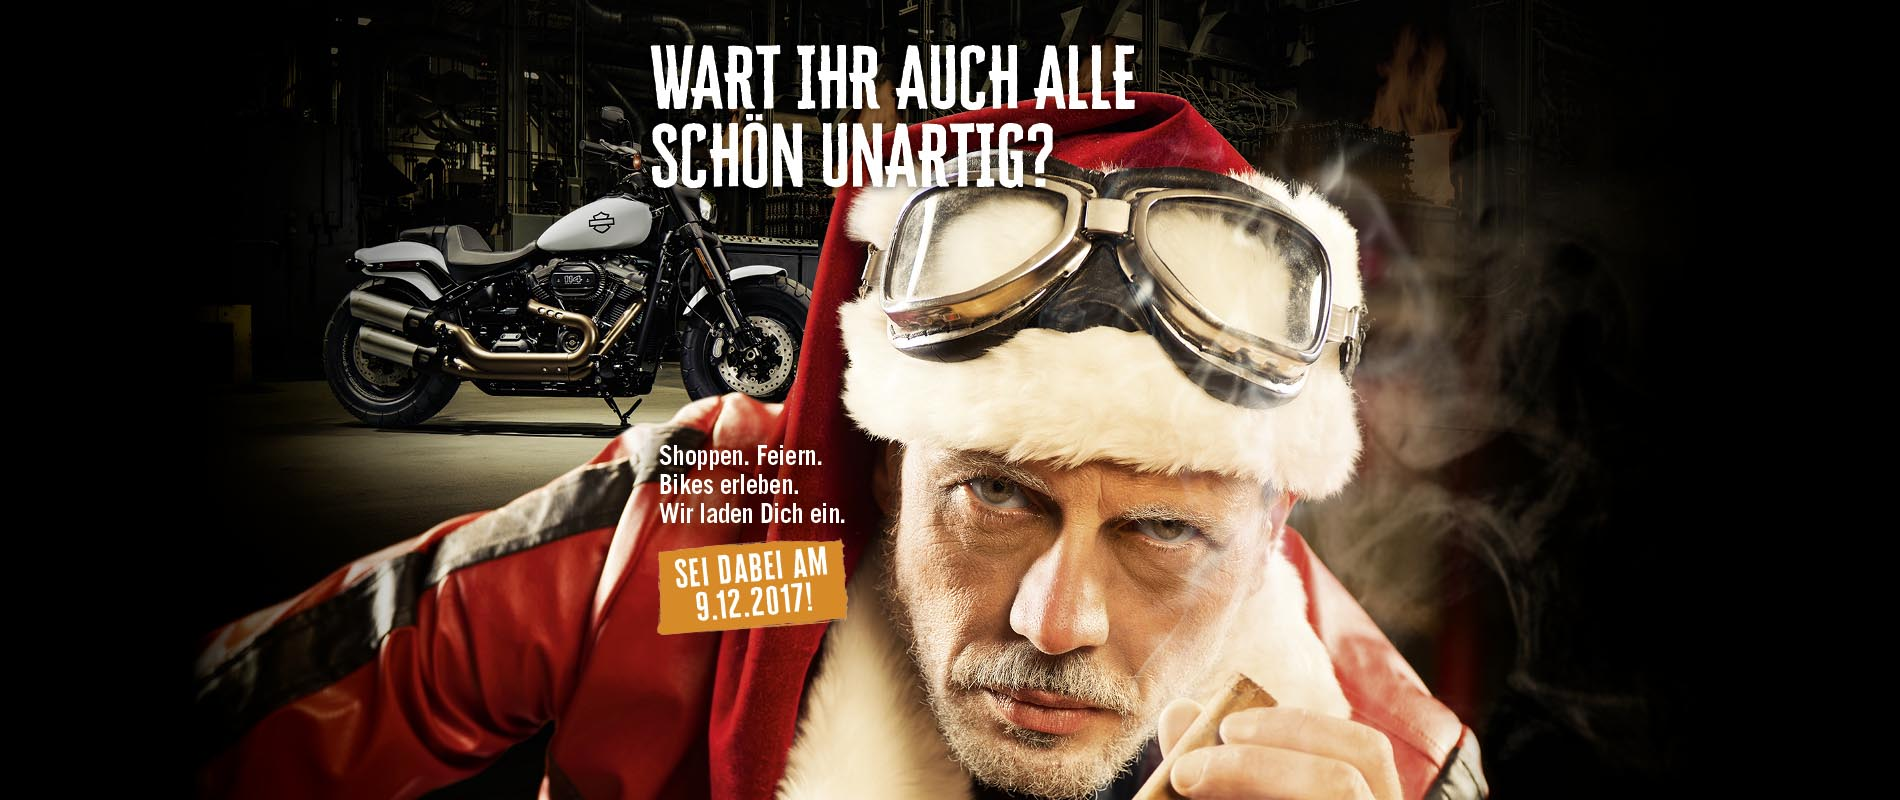 Regensb_Schwarzach_OH_Mot2_Winter_2017_BB1900x800_2